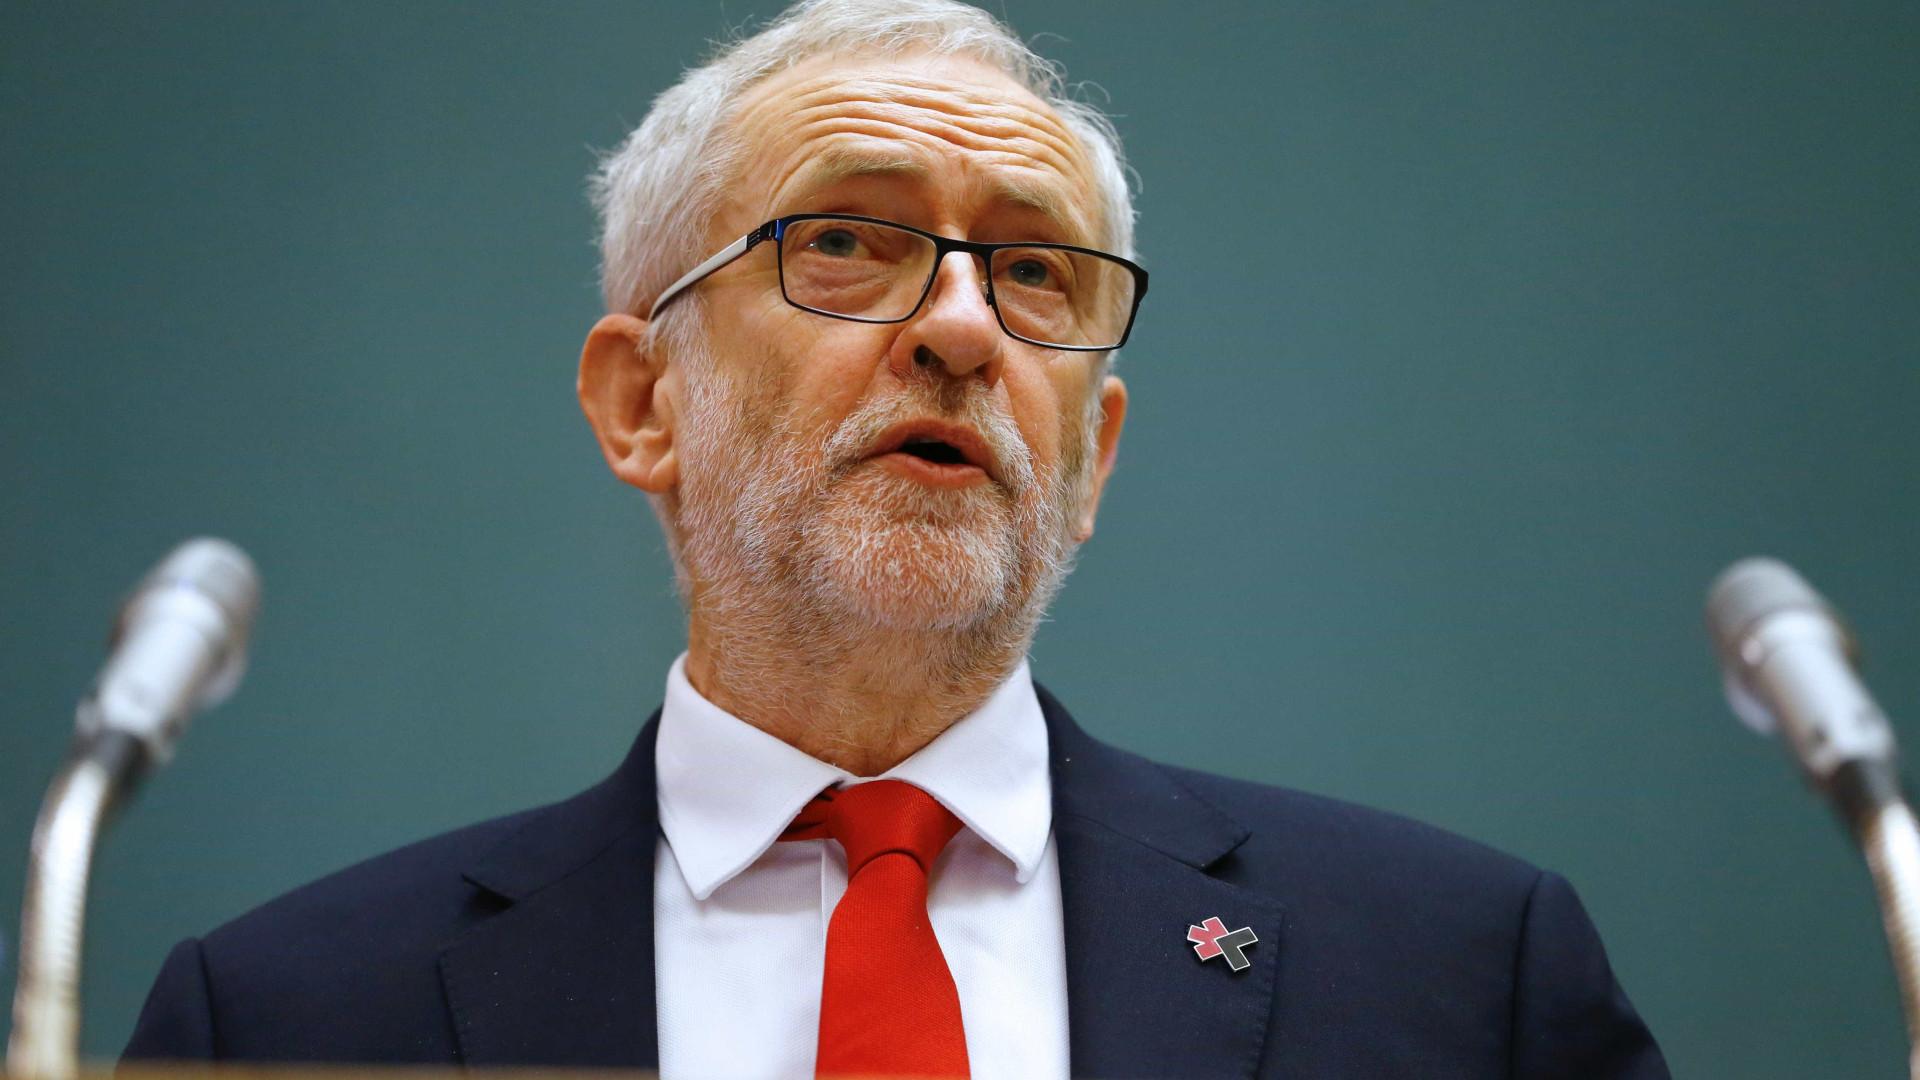 Brexit: Jeremy Corbyn prepara ofensiva para deter saída sem acordo